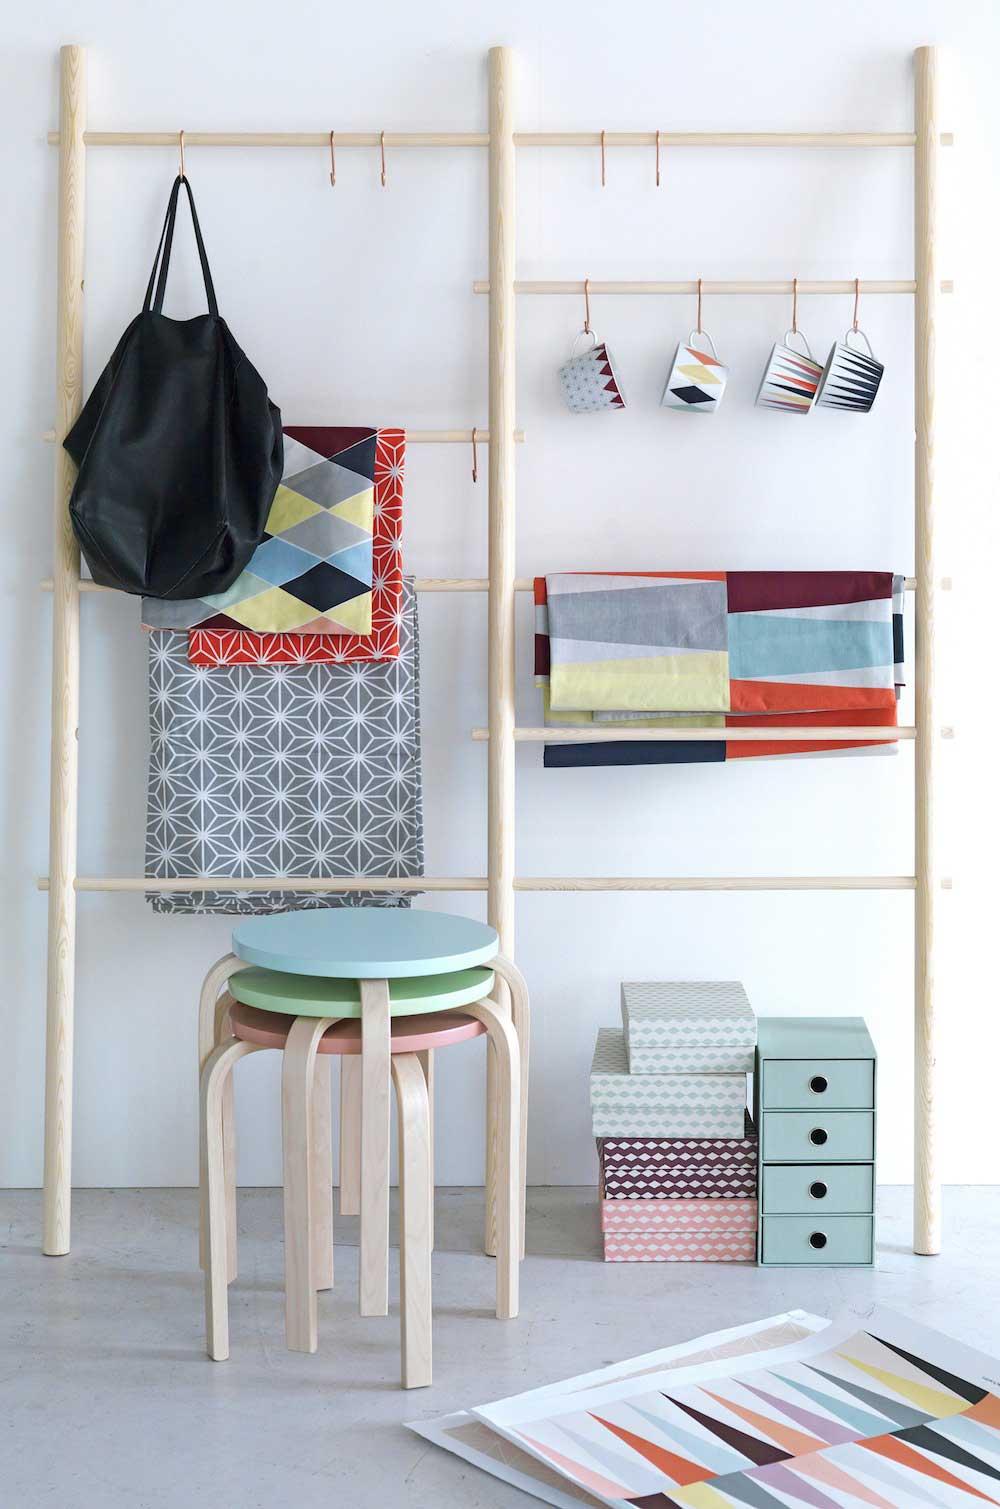 Ikea Bråkig, mobilier et objets déco scandinave